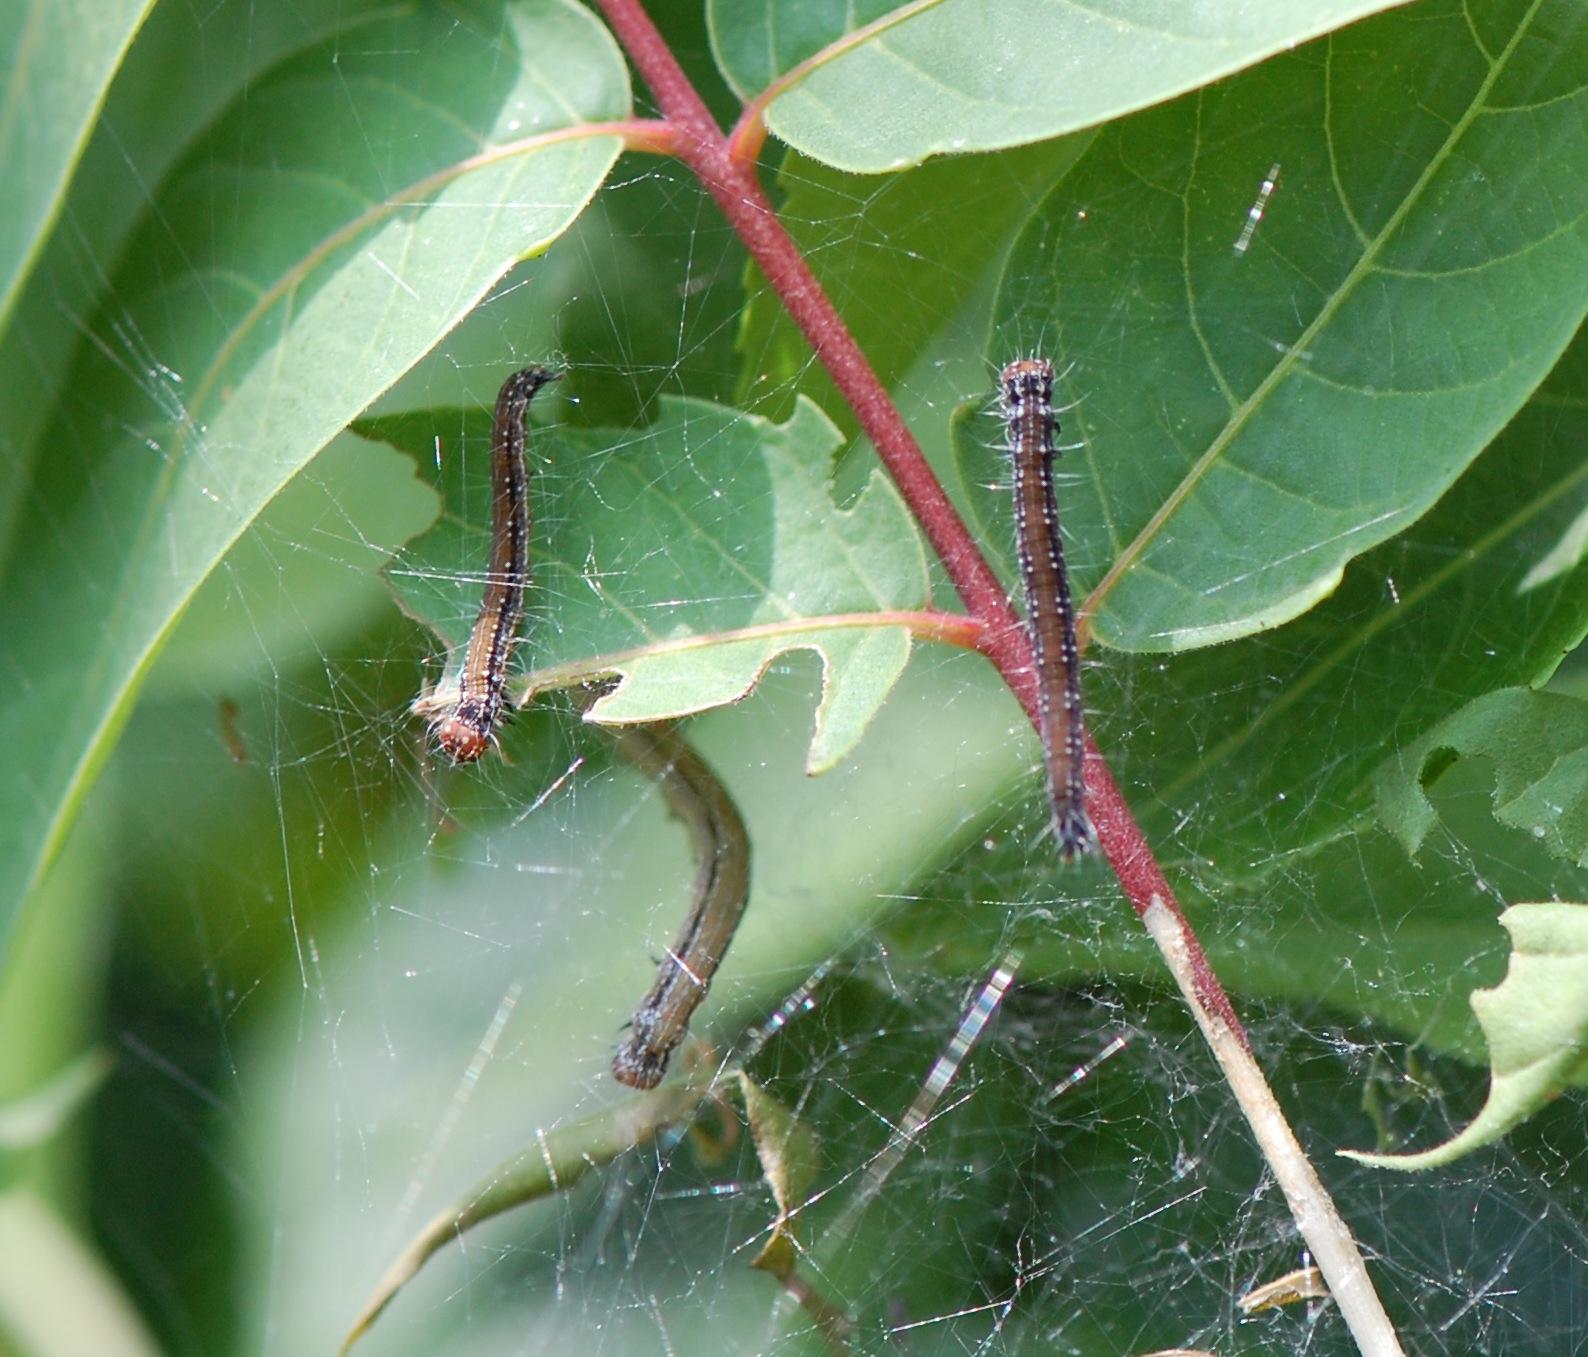 Ailanthus webworm moth caterpillars